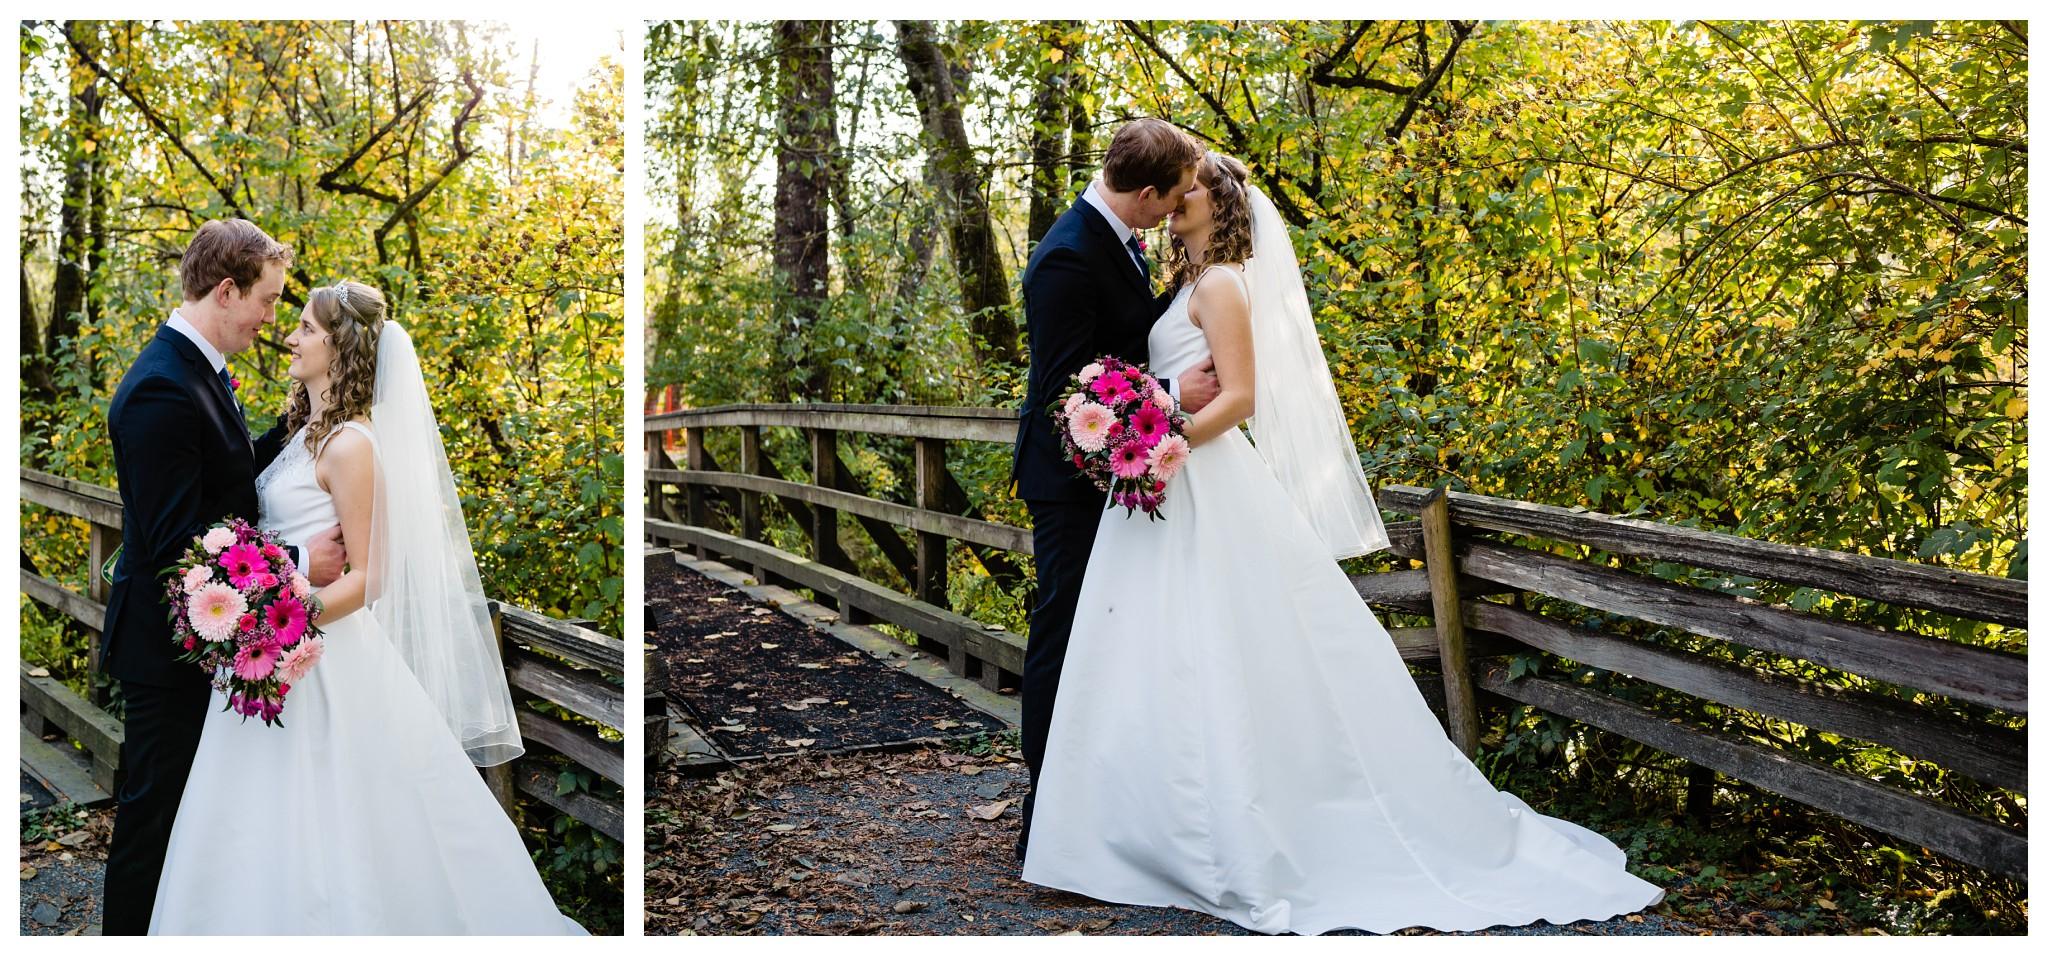 Aldergrove Park Christian Church Wedding Photography Pink Flowers Blue Bridesmaid Dress Fall_0100.jpg